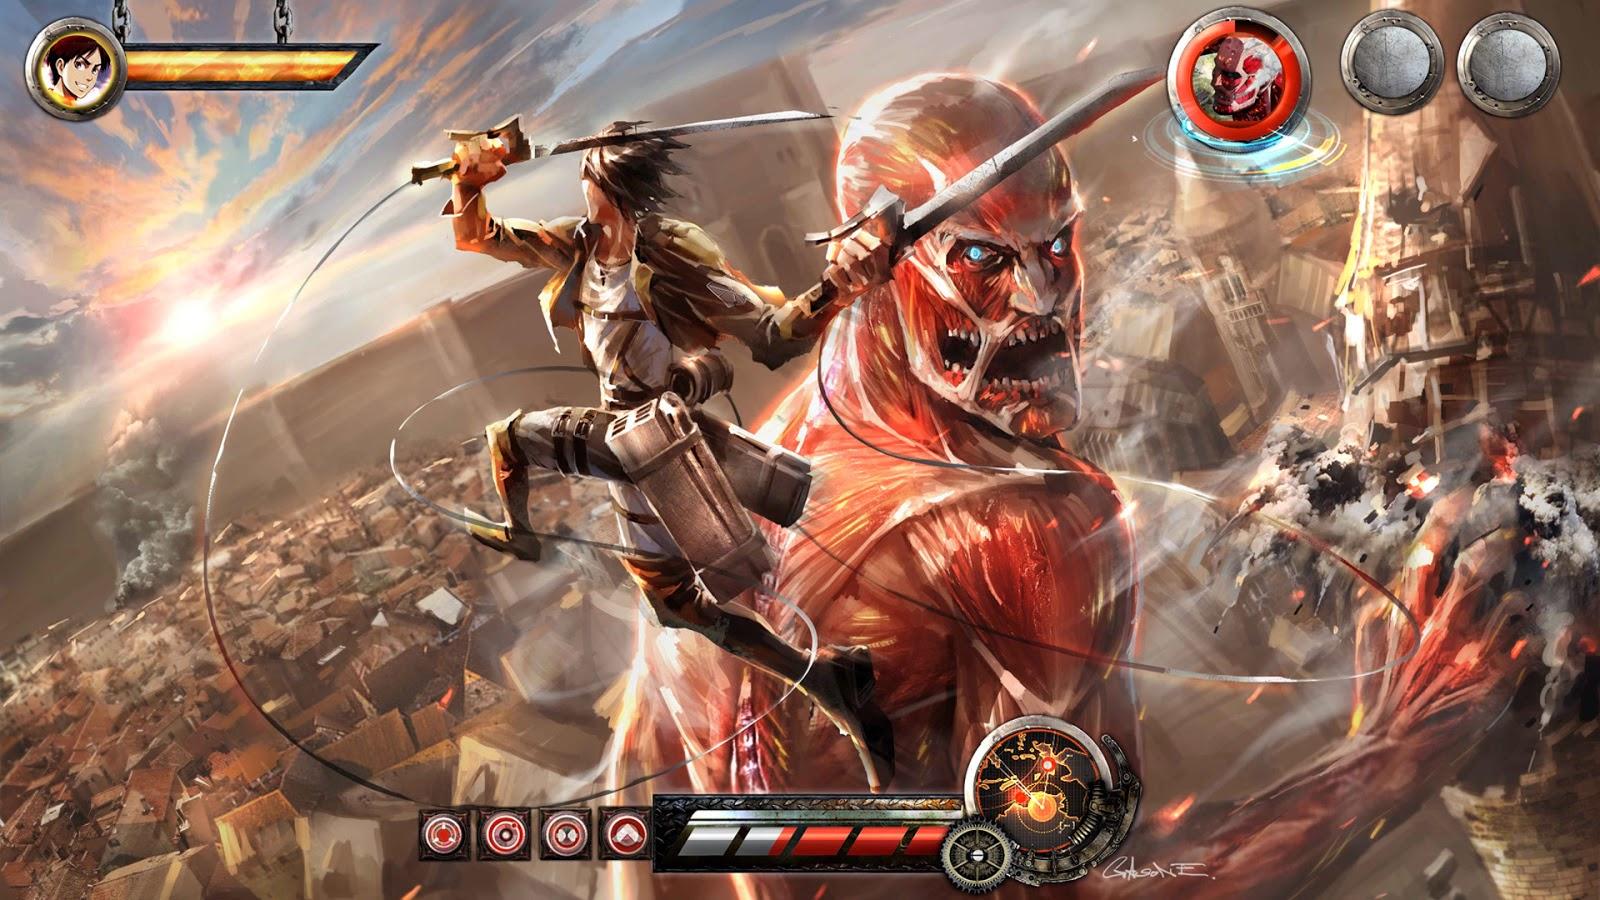 titan video game attack on titan shingeki no kyojin anime hd wallpaper 1600x900